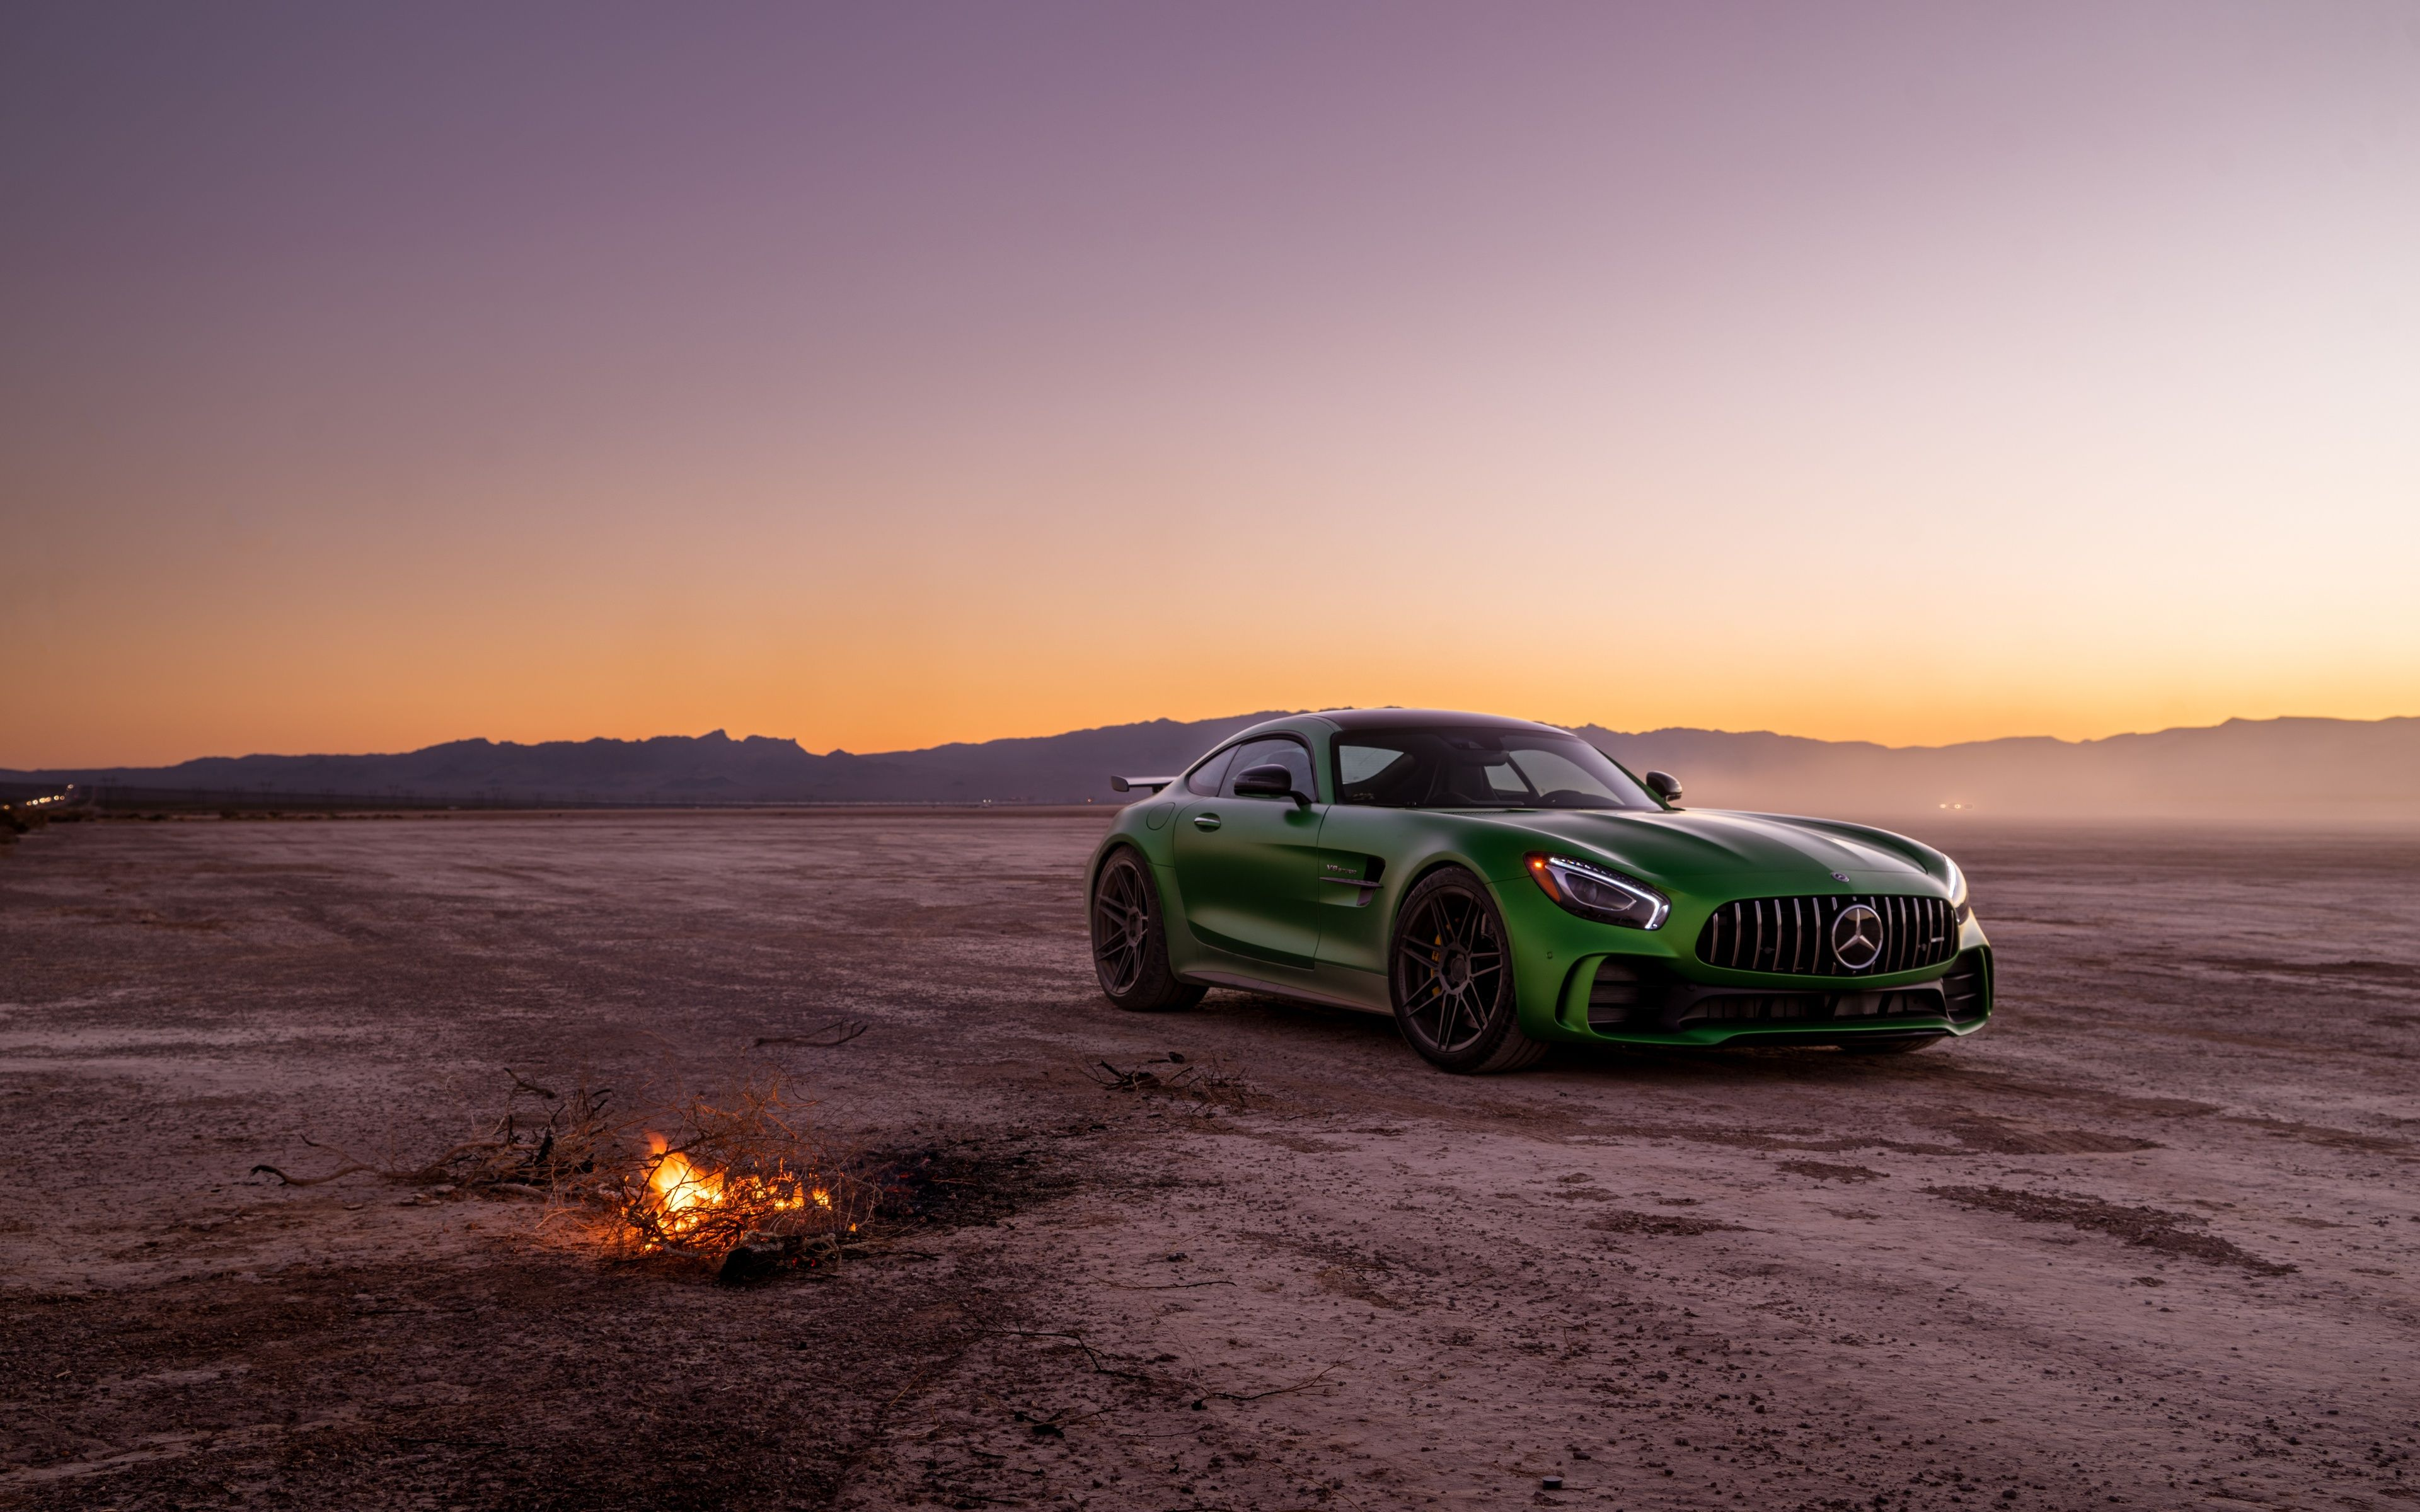 Mercedes Amg Gt R Desert 2018 Cars 4k Supercars Offroad Amg Mercedes Mercedes Amg Gt R Mercedes Wallpaper Mercedes Amg